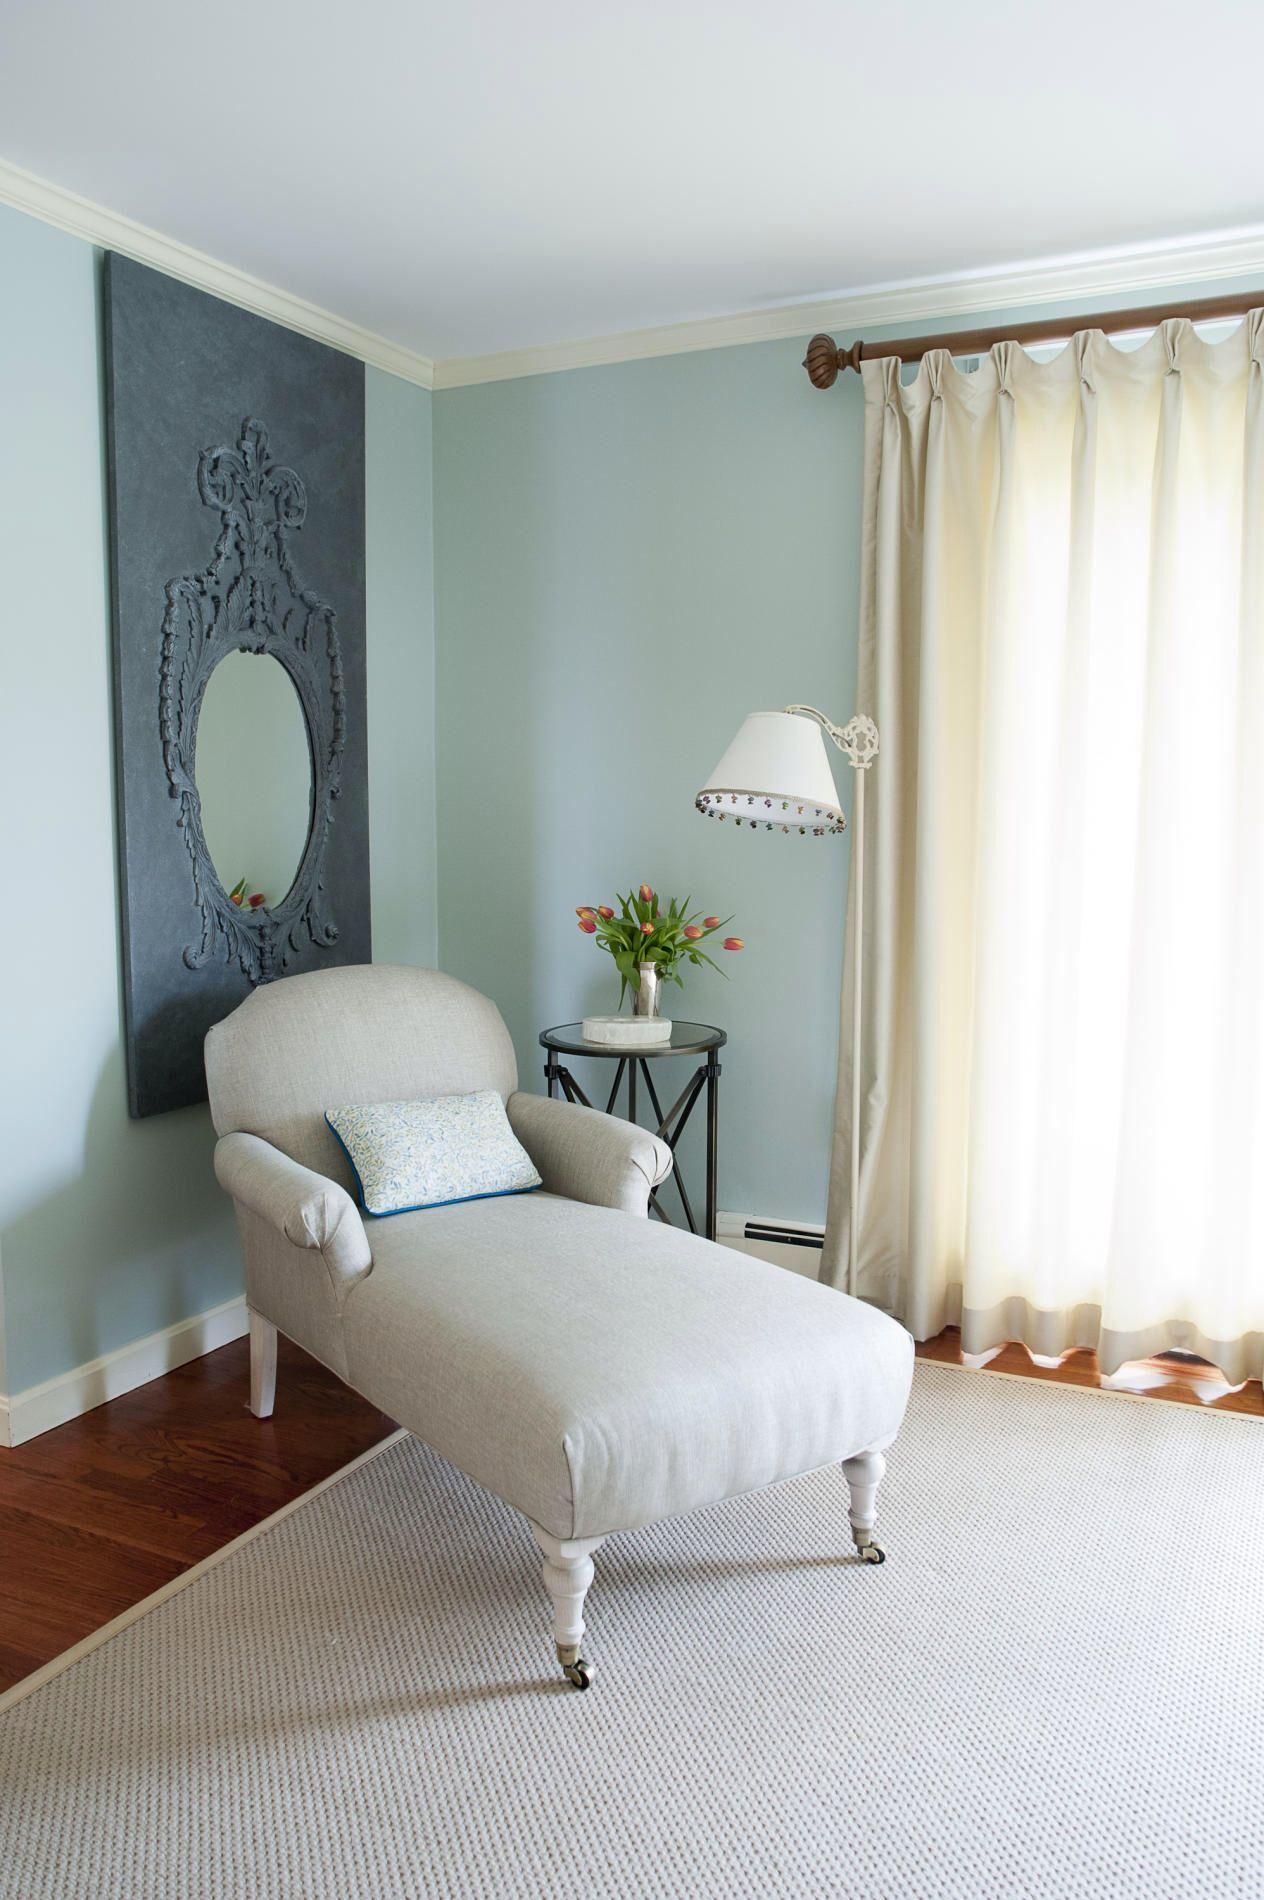 Benjamin Moore Palladium blue 1st floor paint color made in